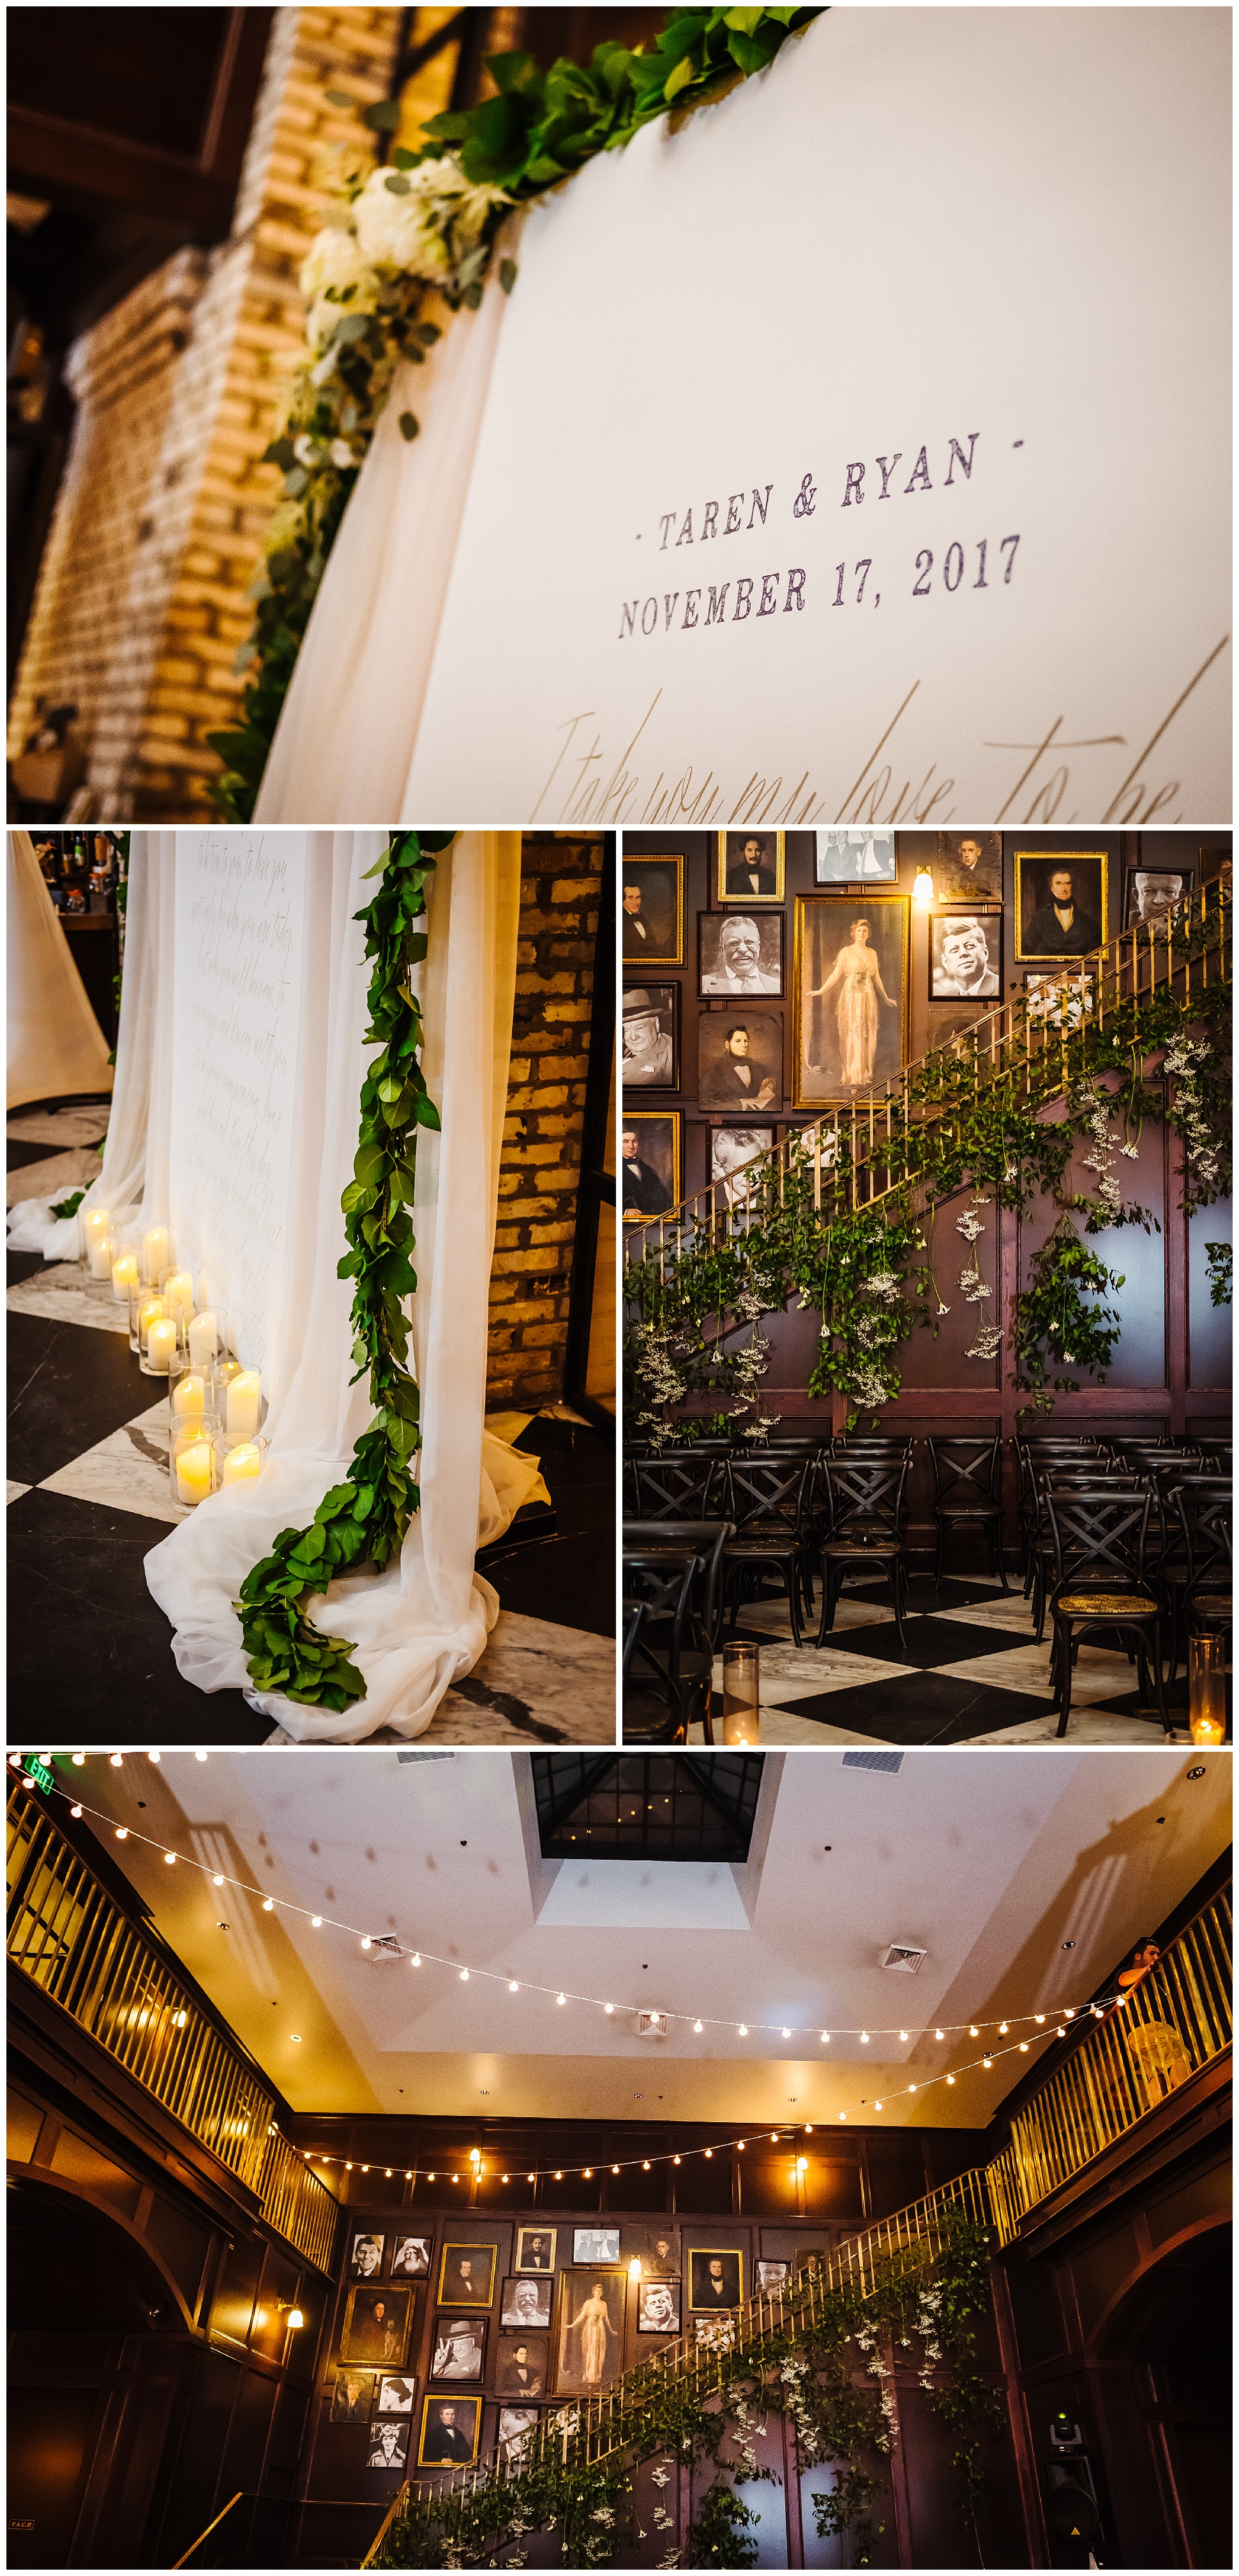 tampa-wedding-photographer-oxford-exchange-garland-candlelight-gold-hayley-paige_0042.jpg